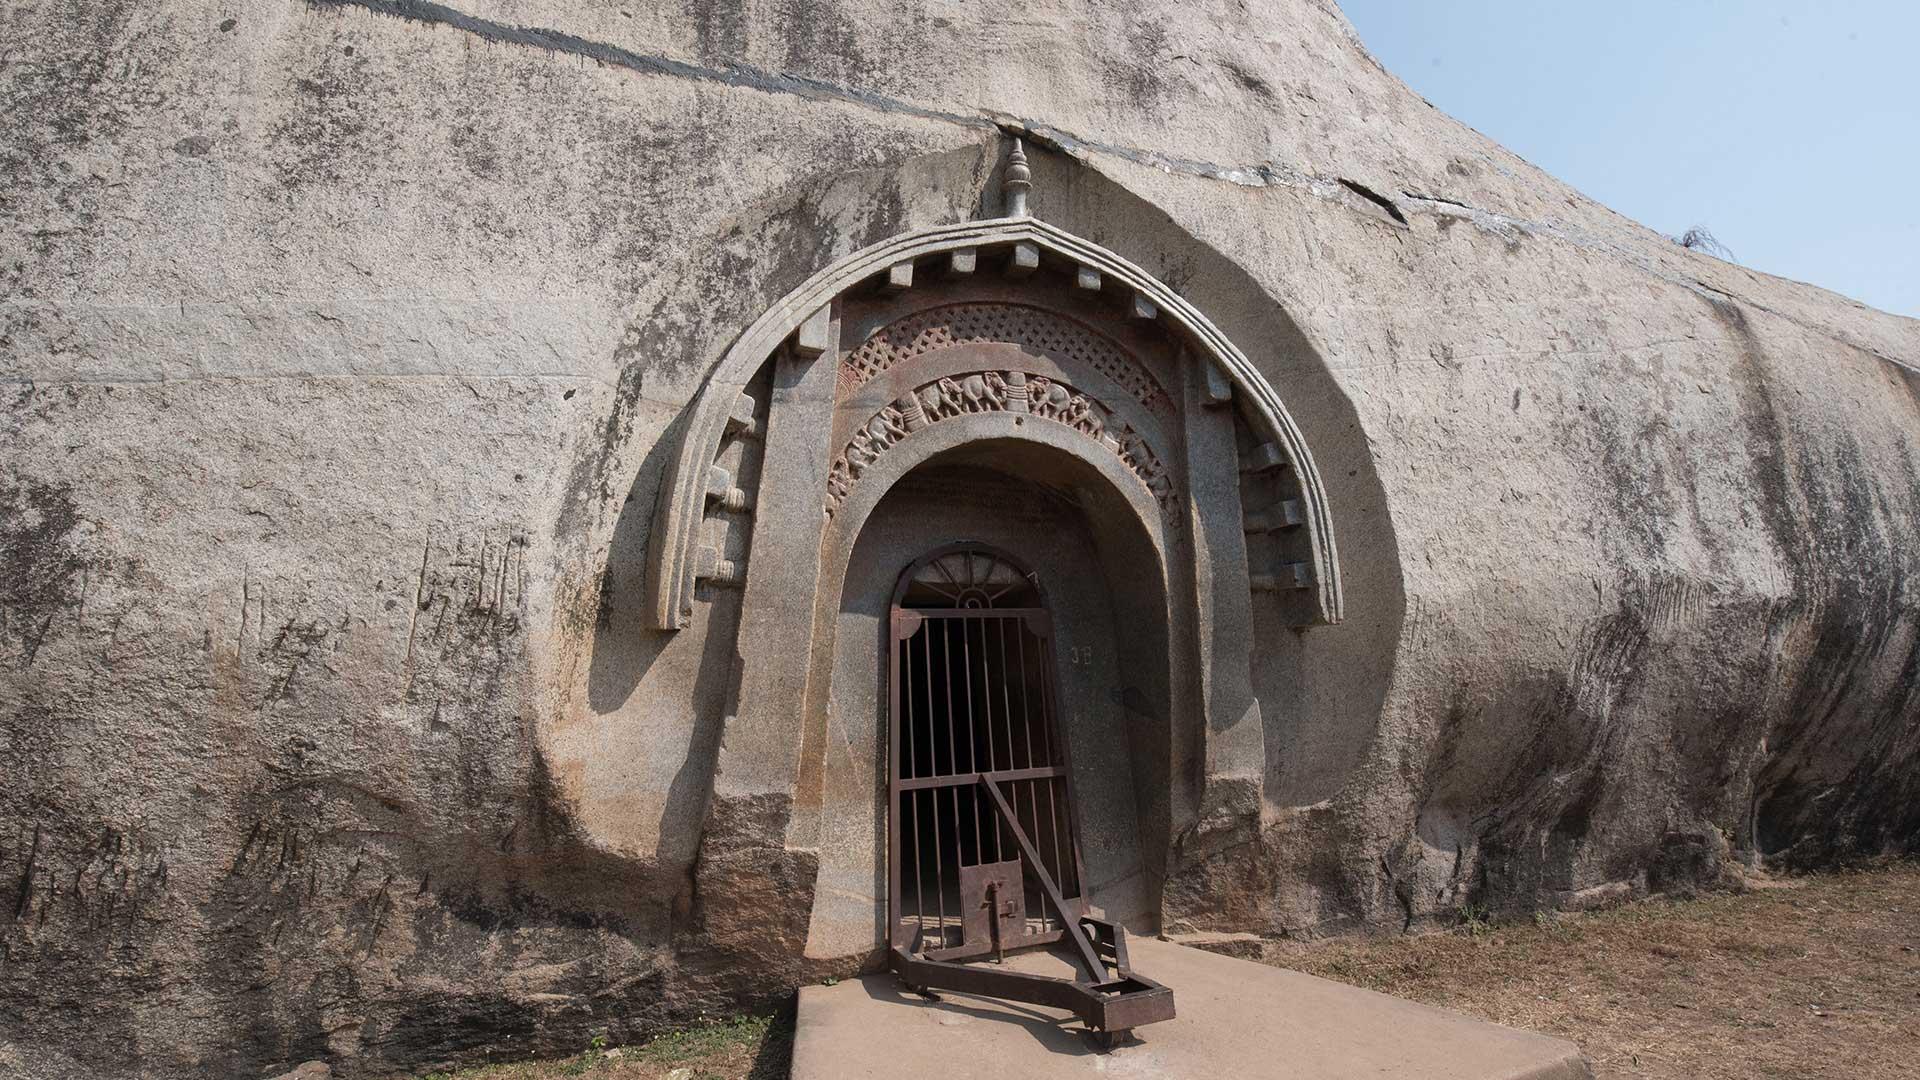 Barabar-BAM-film-granit-miroir-pyramide-inde-yoga-archeologie-12